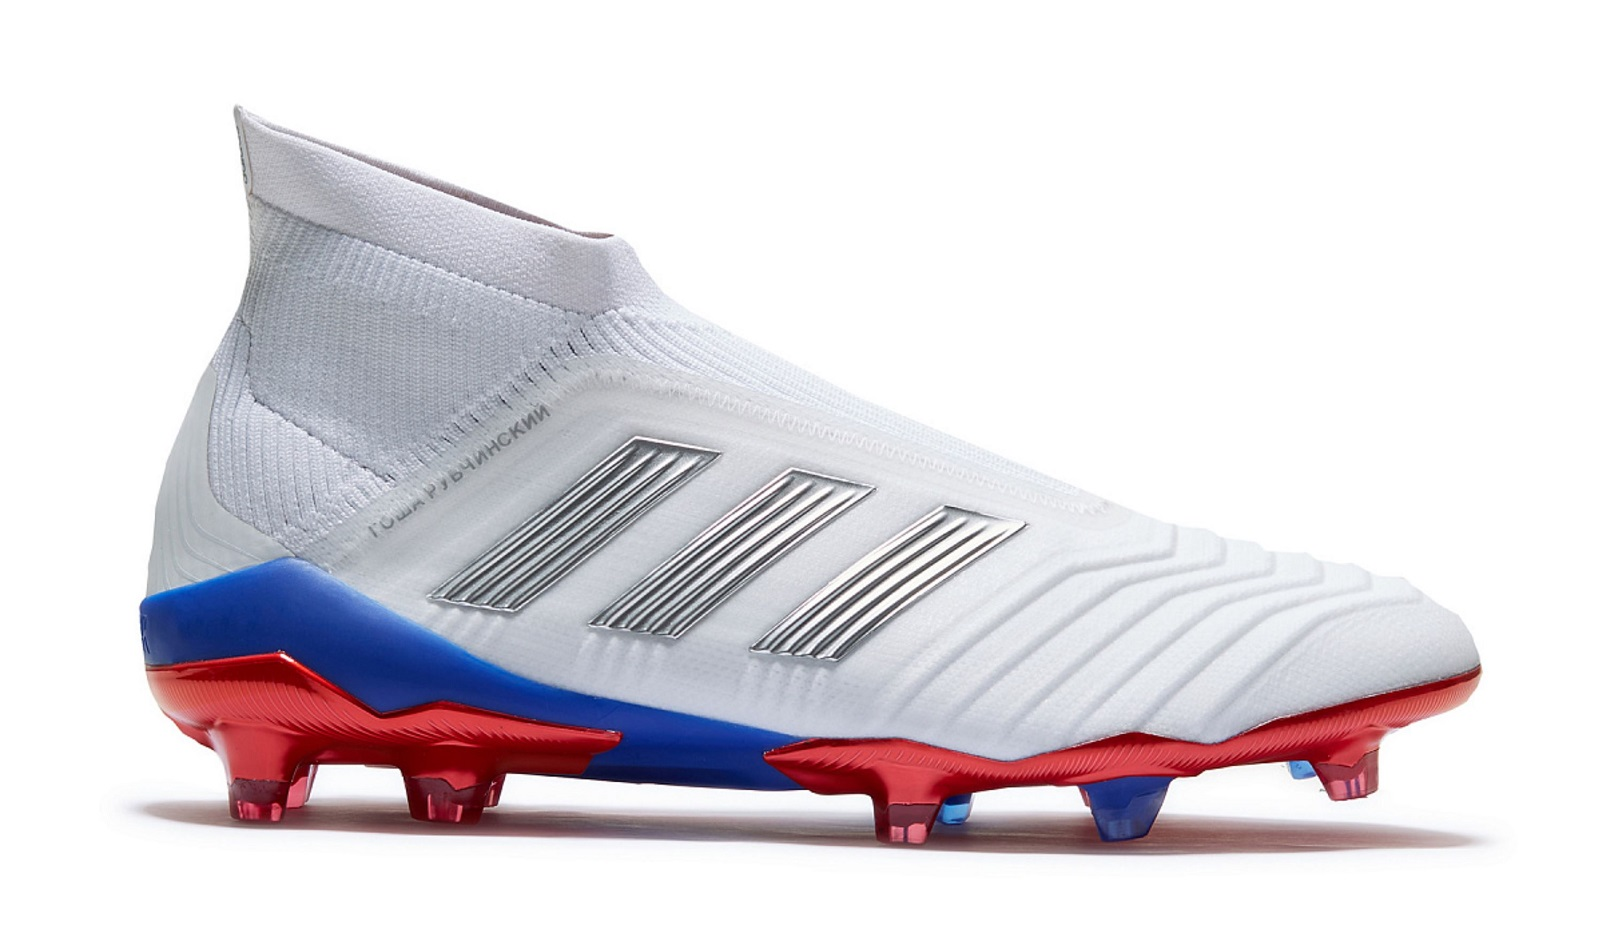 Special Edition adidas x Gosha Rubch-inskiy PRougeator 18+ 2018 World Cup